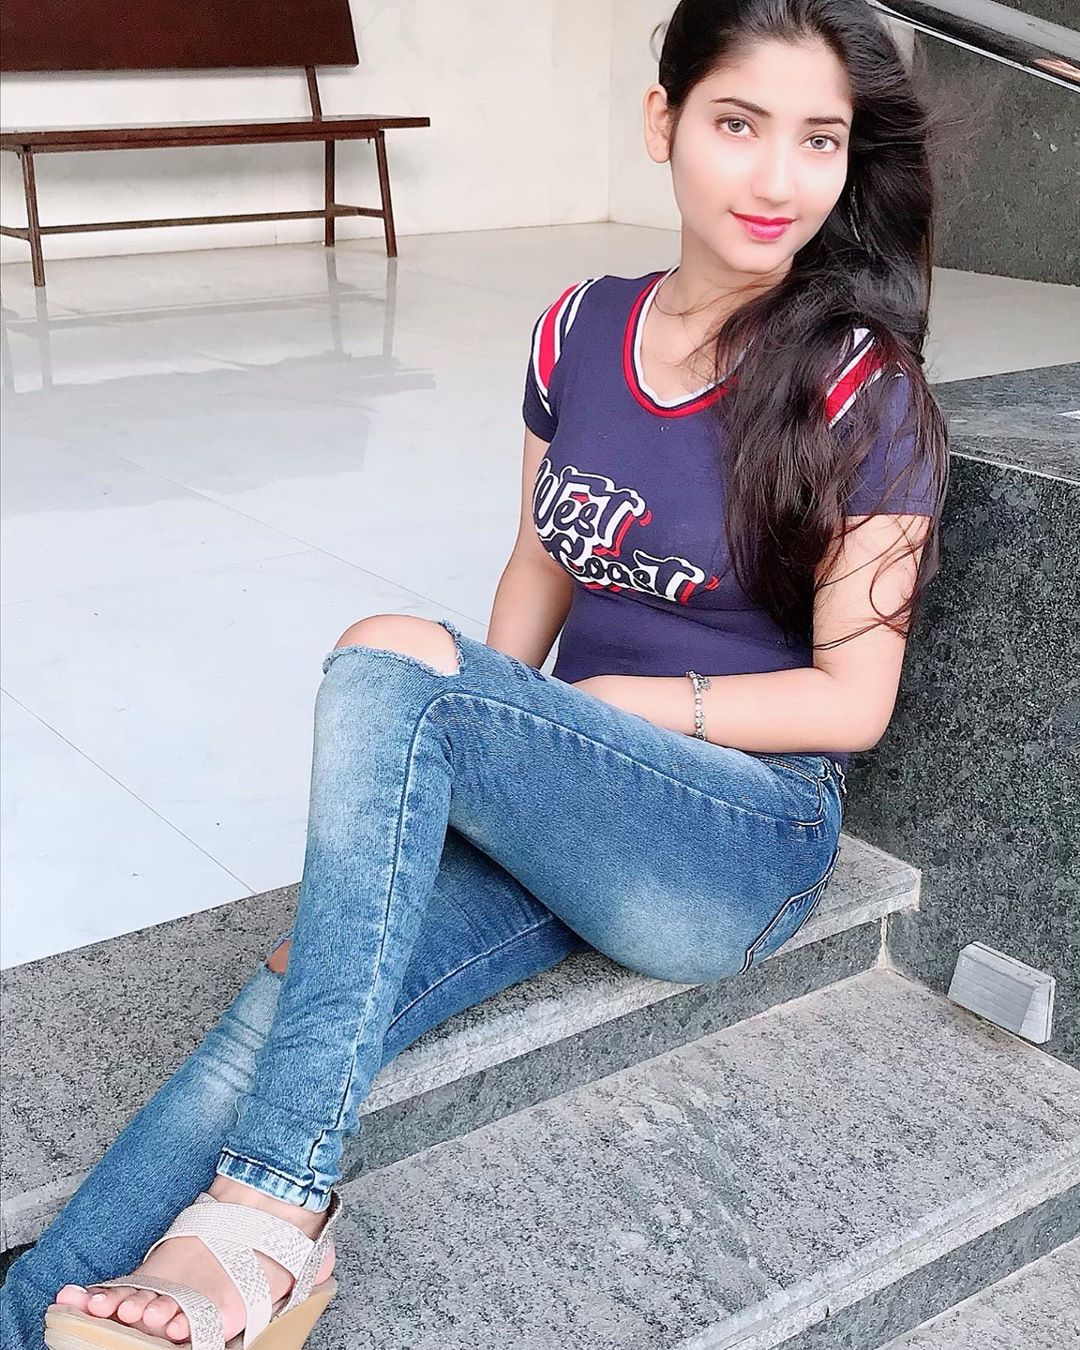 Angel Rai (Tik Tok Star) Biography Age, Family, Height